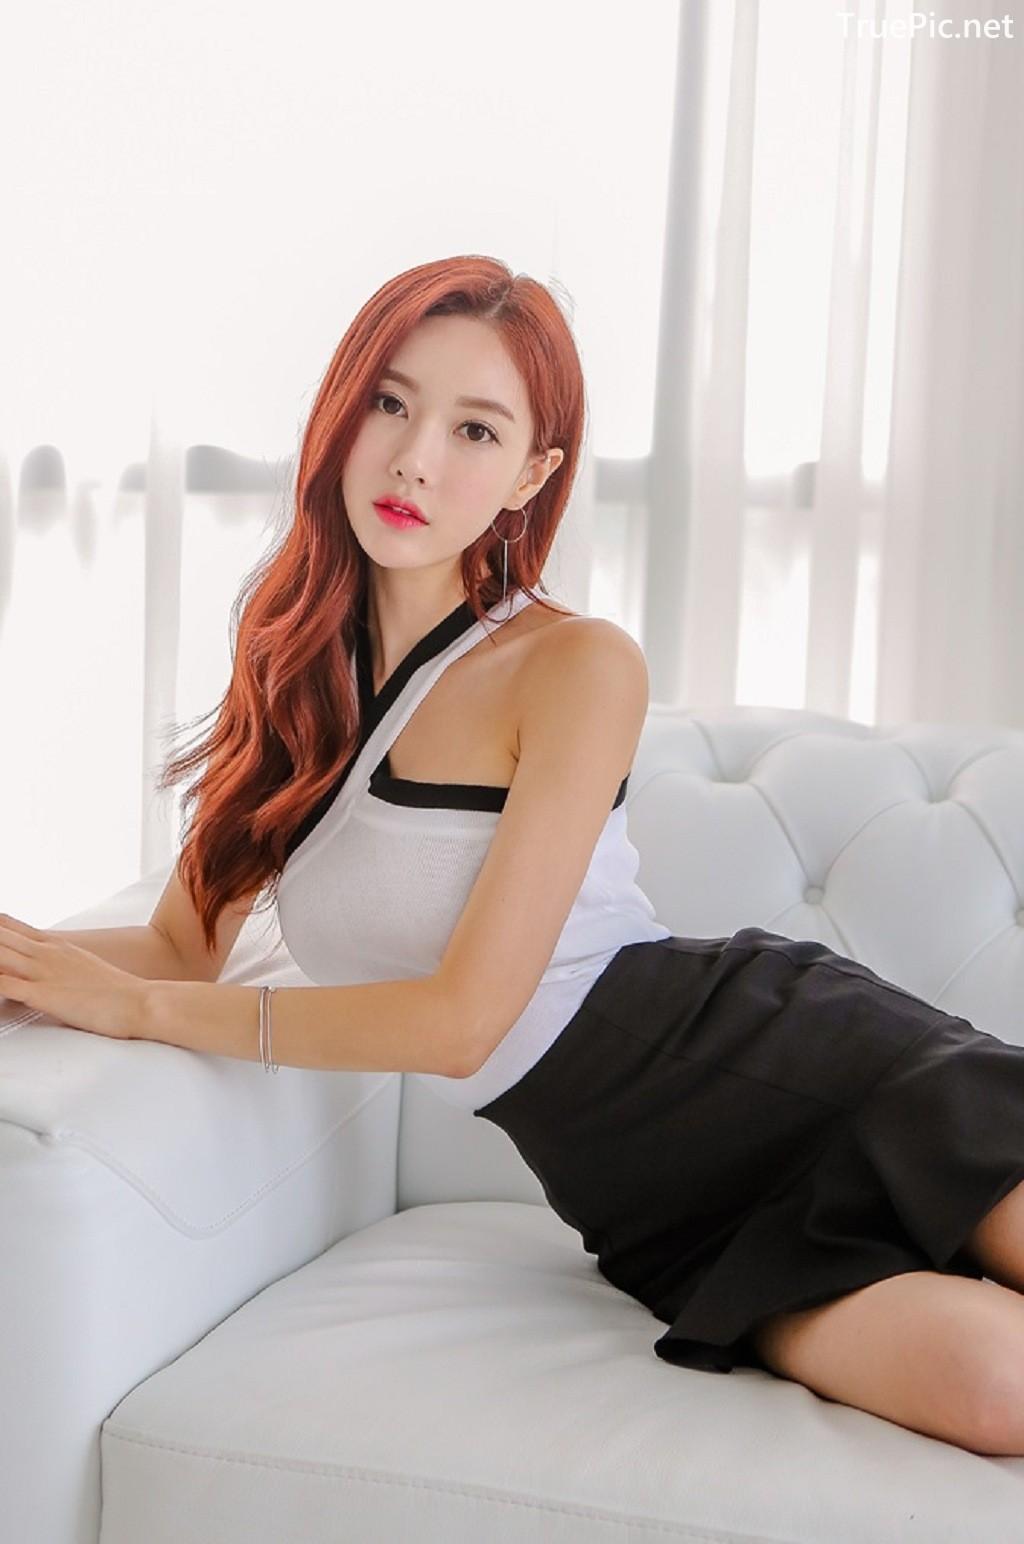 Image-Korean-Fashion-Model-Hyemi-Korean-Outfits-Fashion-TruePic.net- Picture-2